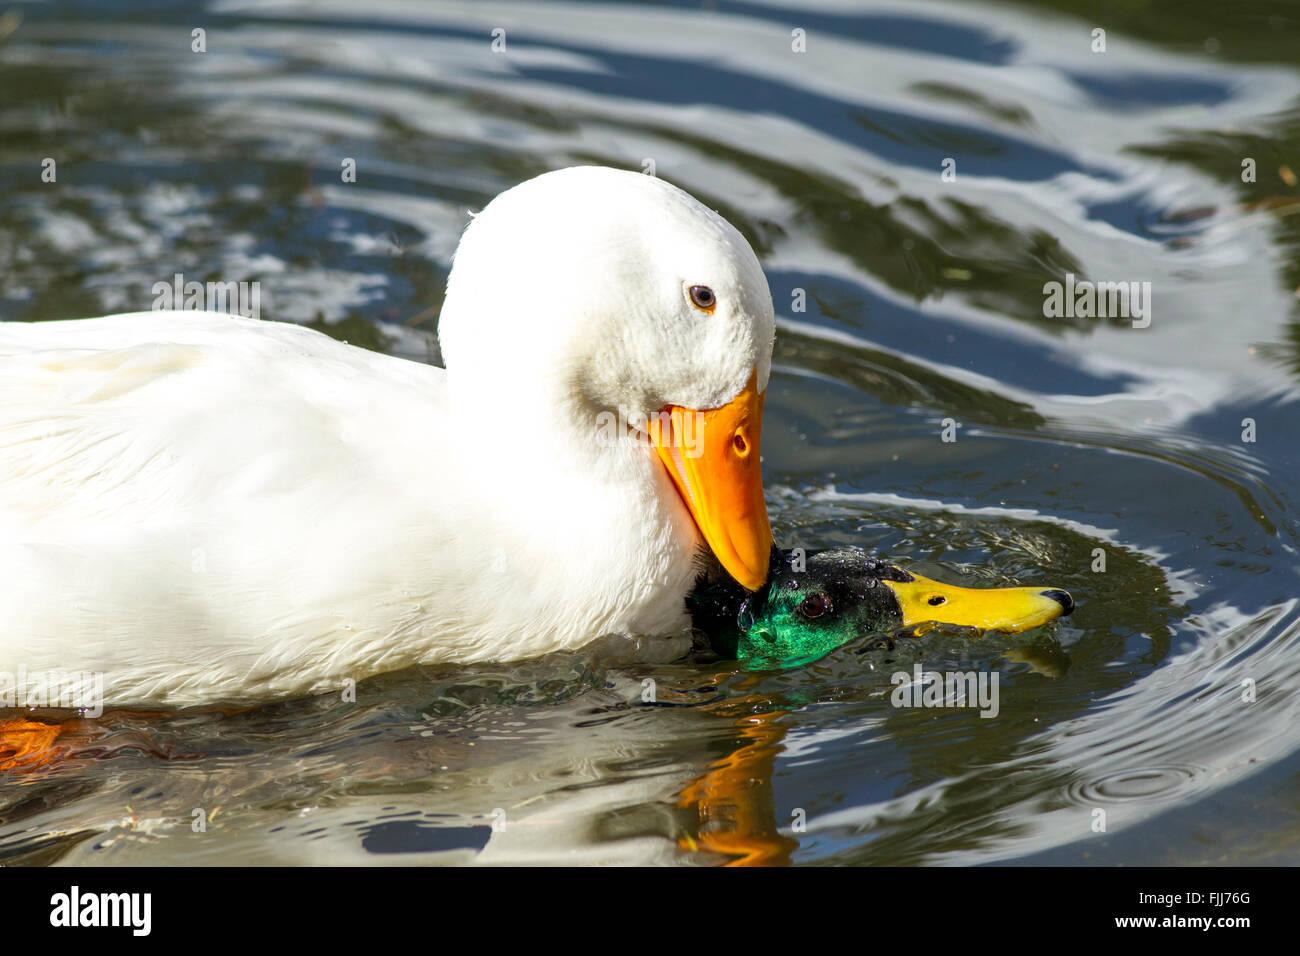 Pekin duck fights with mallard. - Stock Image